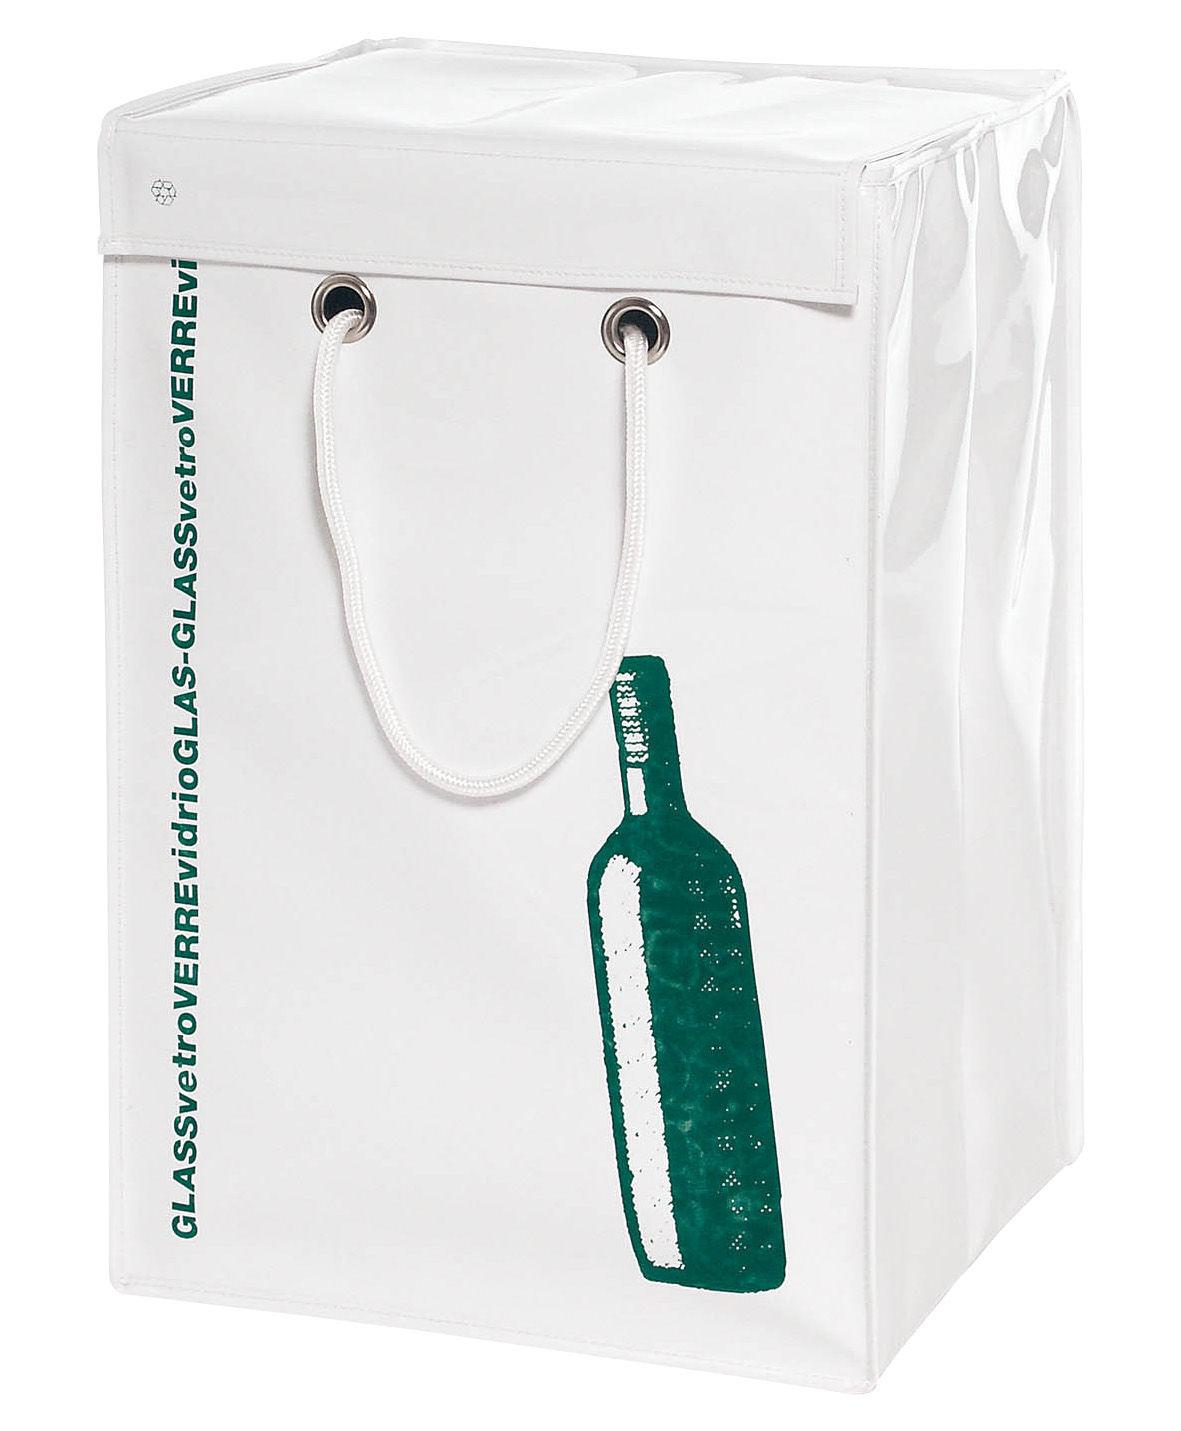 poubelle de tri recyclage verre verre blanc motif vert seletti. Black Bedroom Furniture Sets. Home Design Ideas